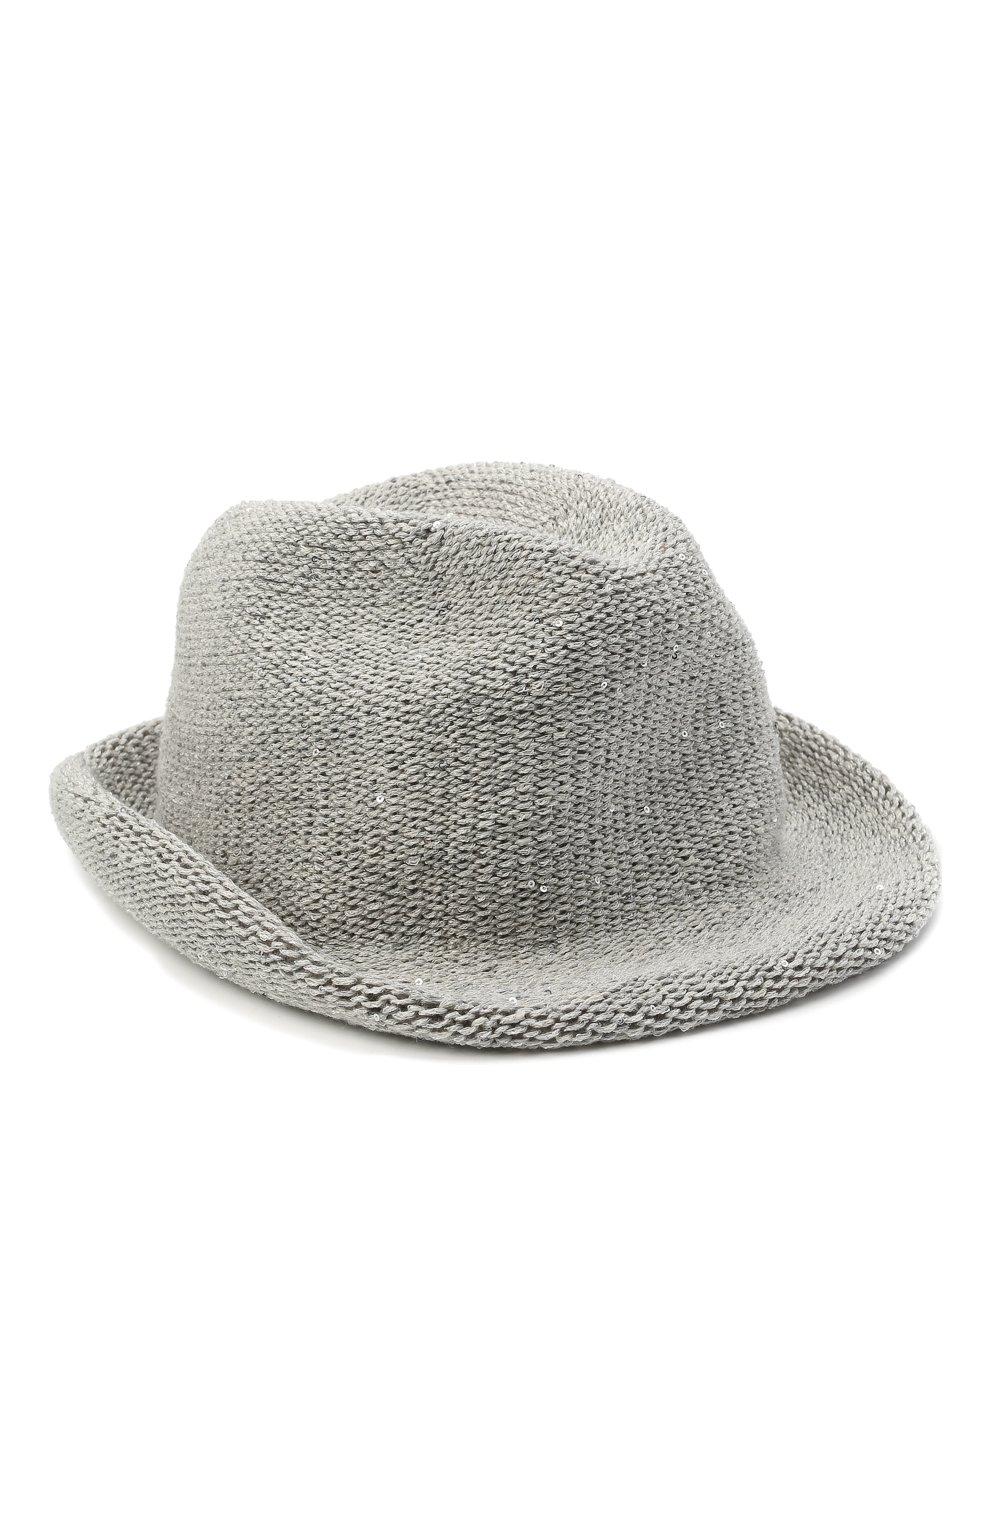 Женская шляпа LORENA ANTONIAZZI светло-серого цвета, арт. P2189CE002/2815 | Фото 1 (Материал: Текстиль, Лен)